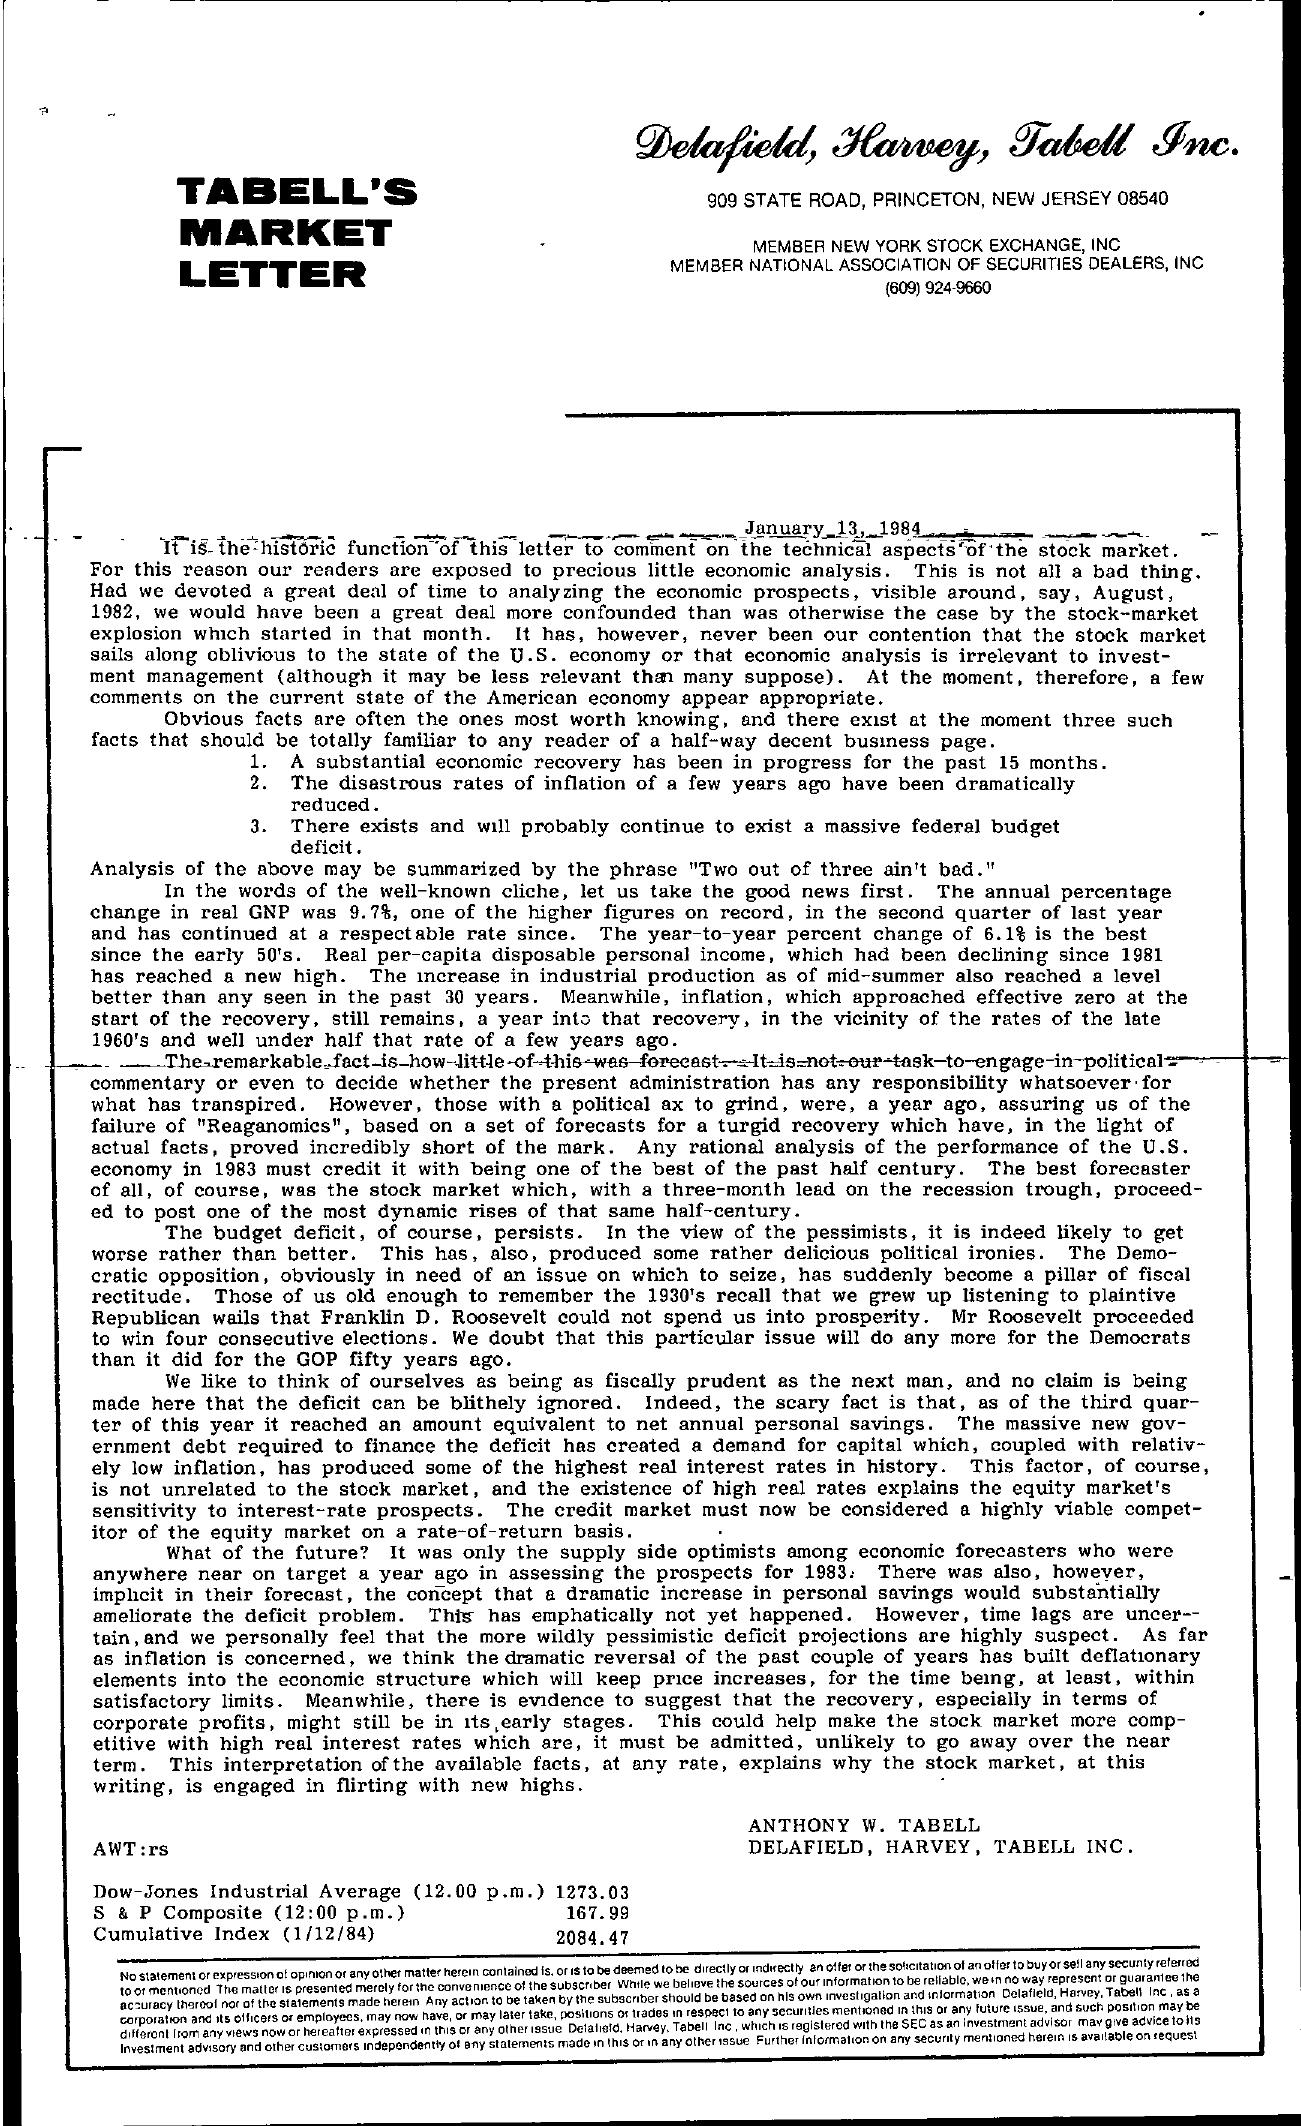 Tabell's Market Letter - January 13, 1984